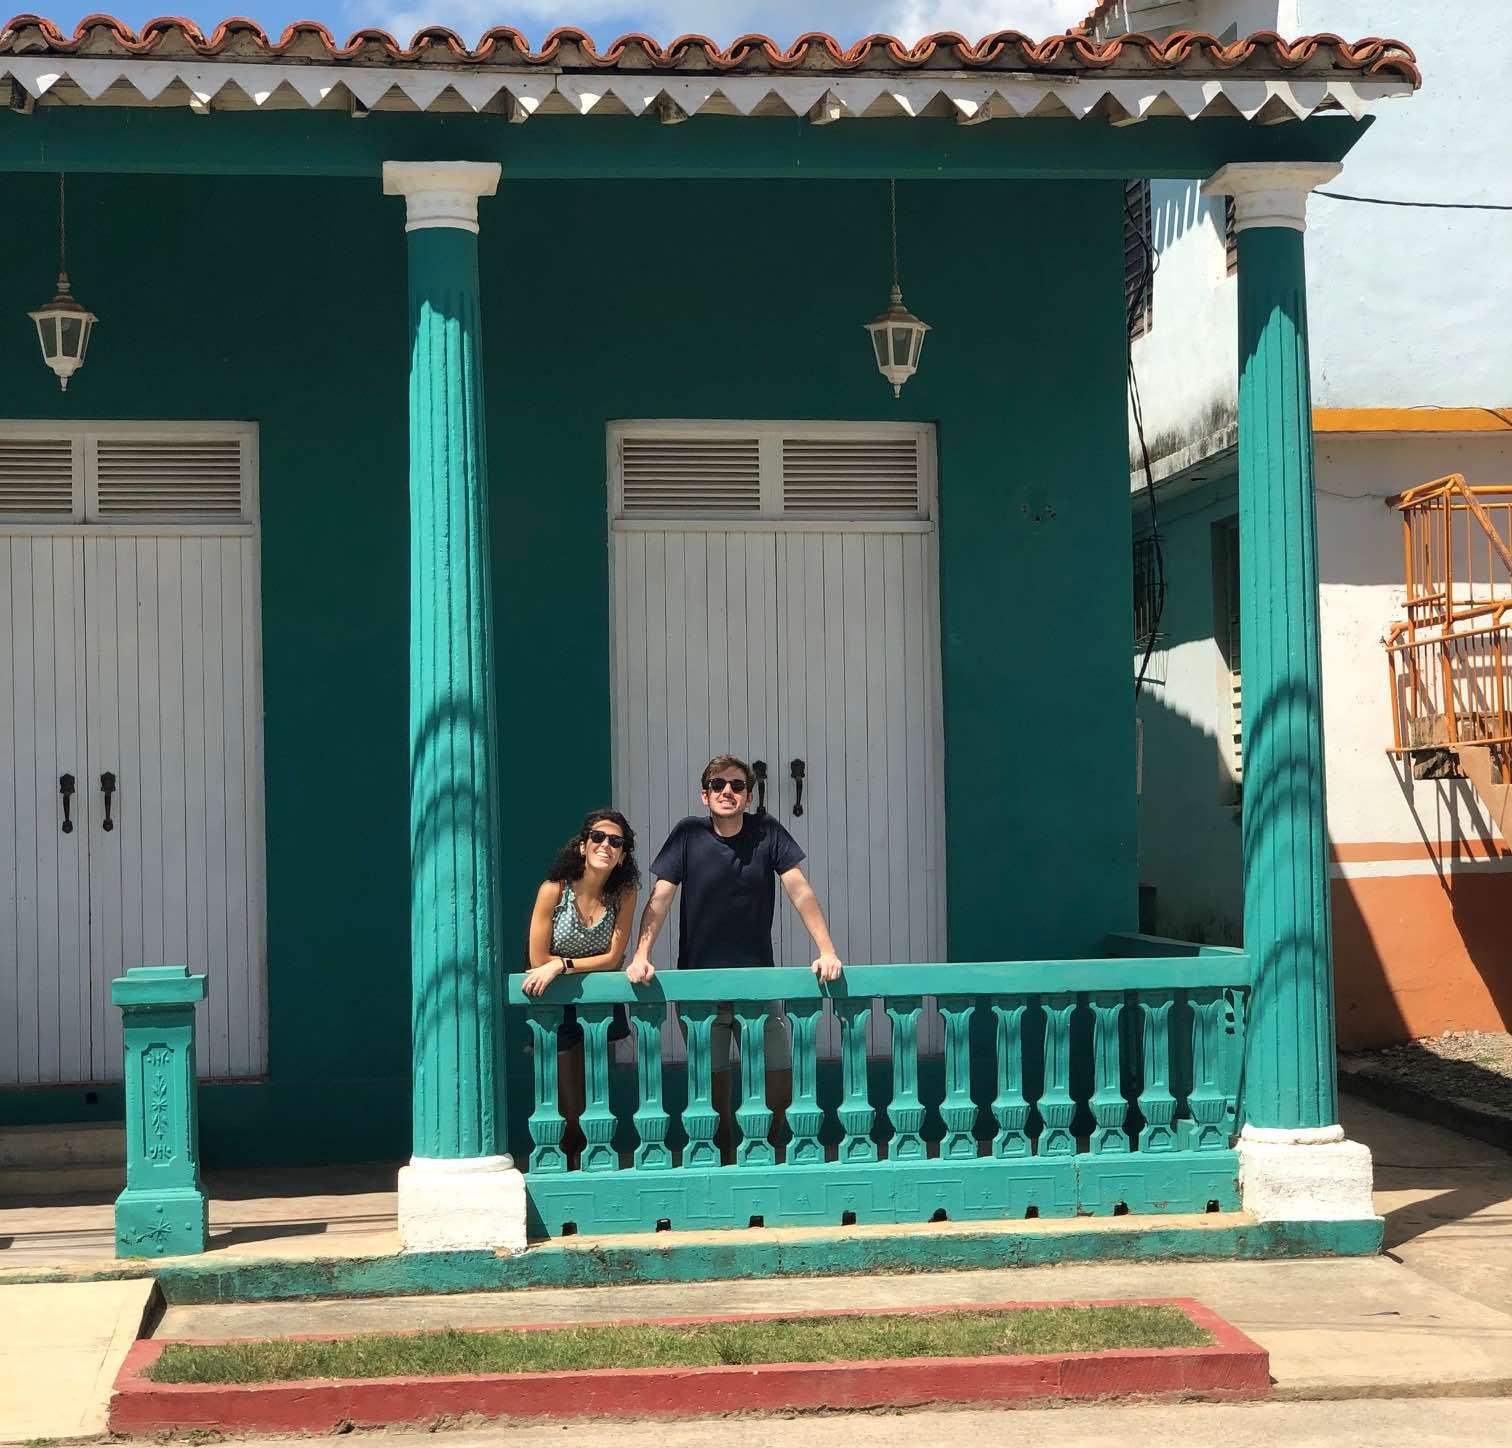 Ruta por Cuba - Viñales